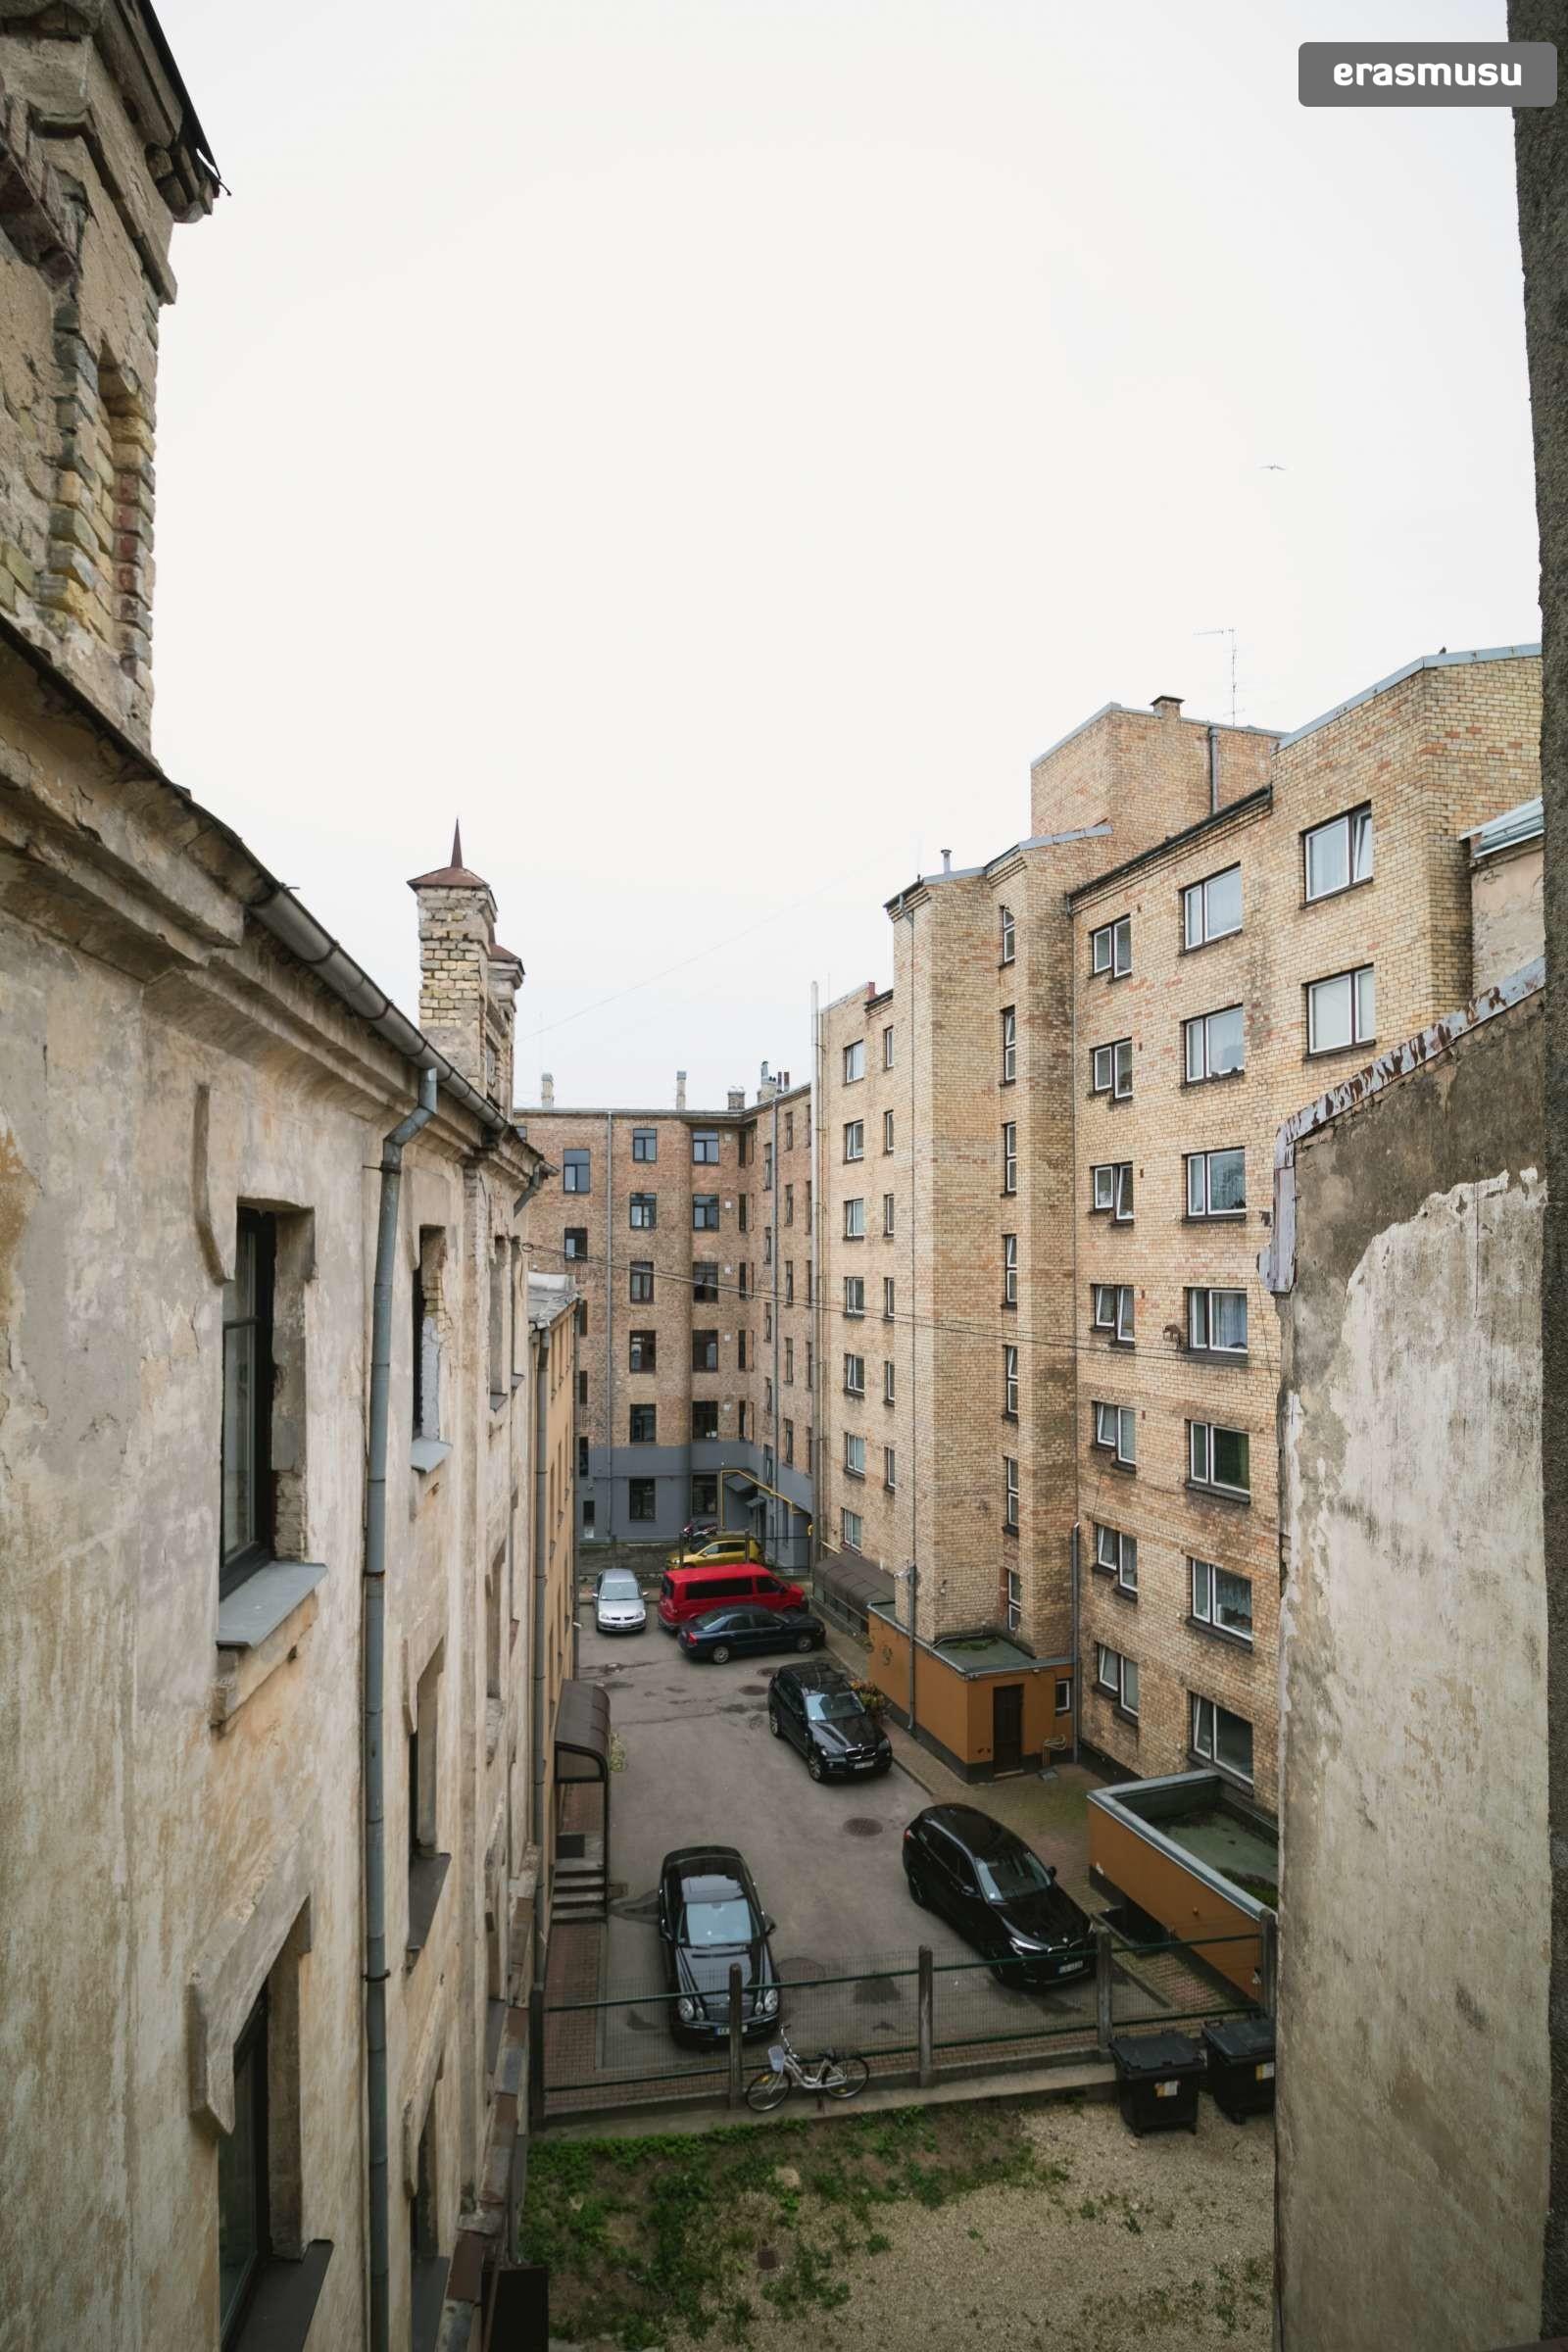 modern-studio-apartment-rent-maskavas-forstate-c39108d20067e6c0c